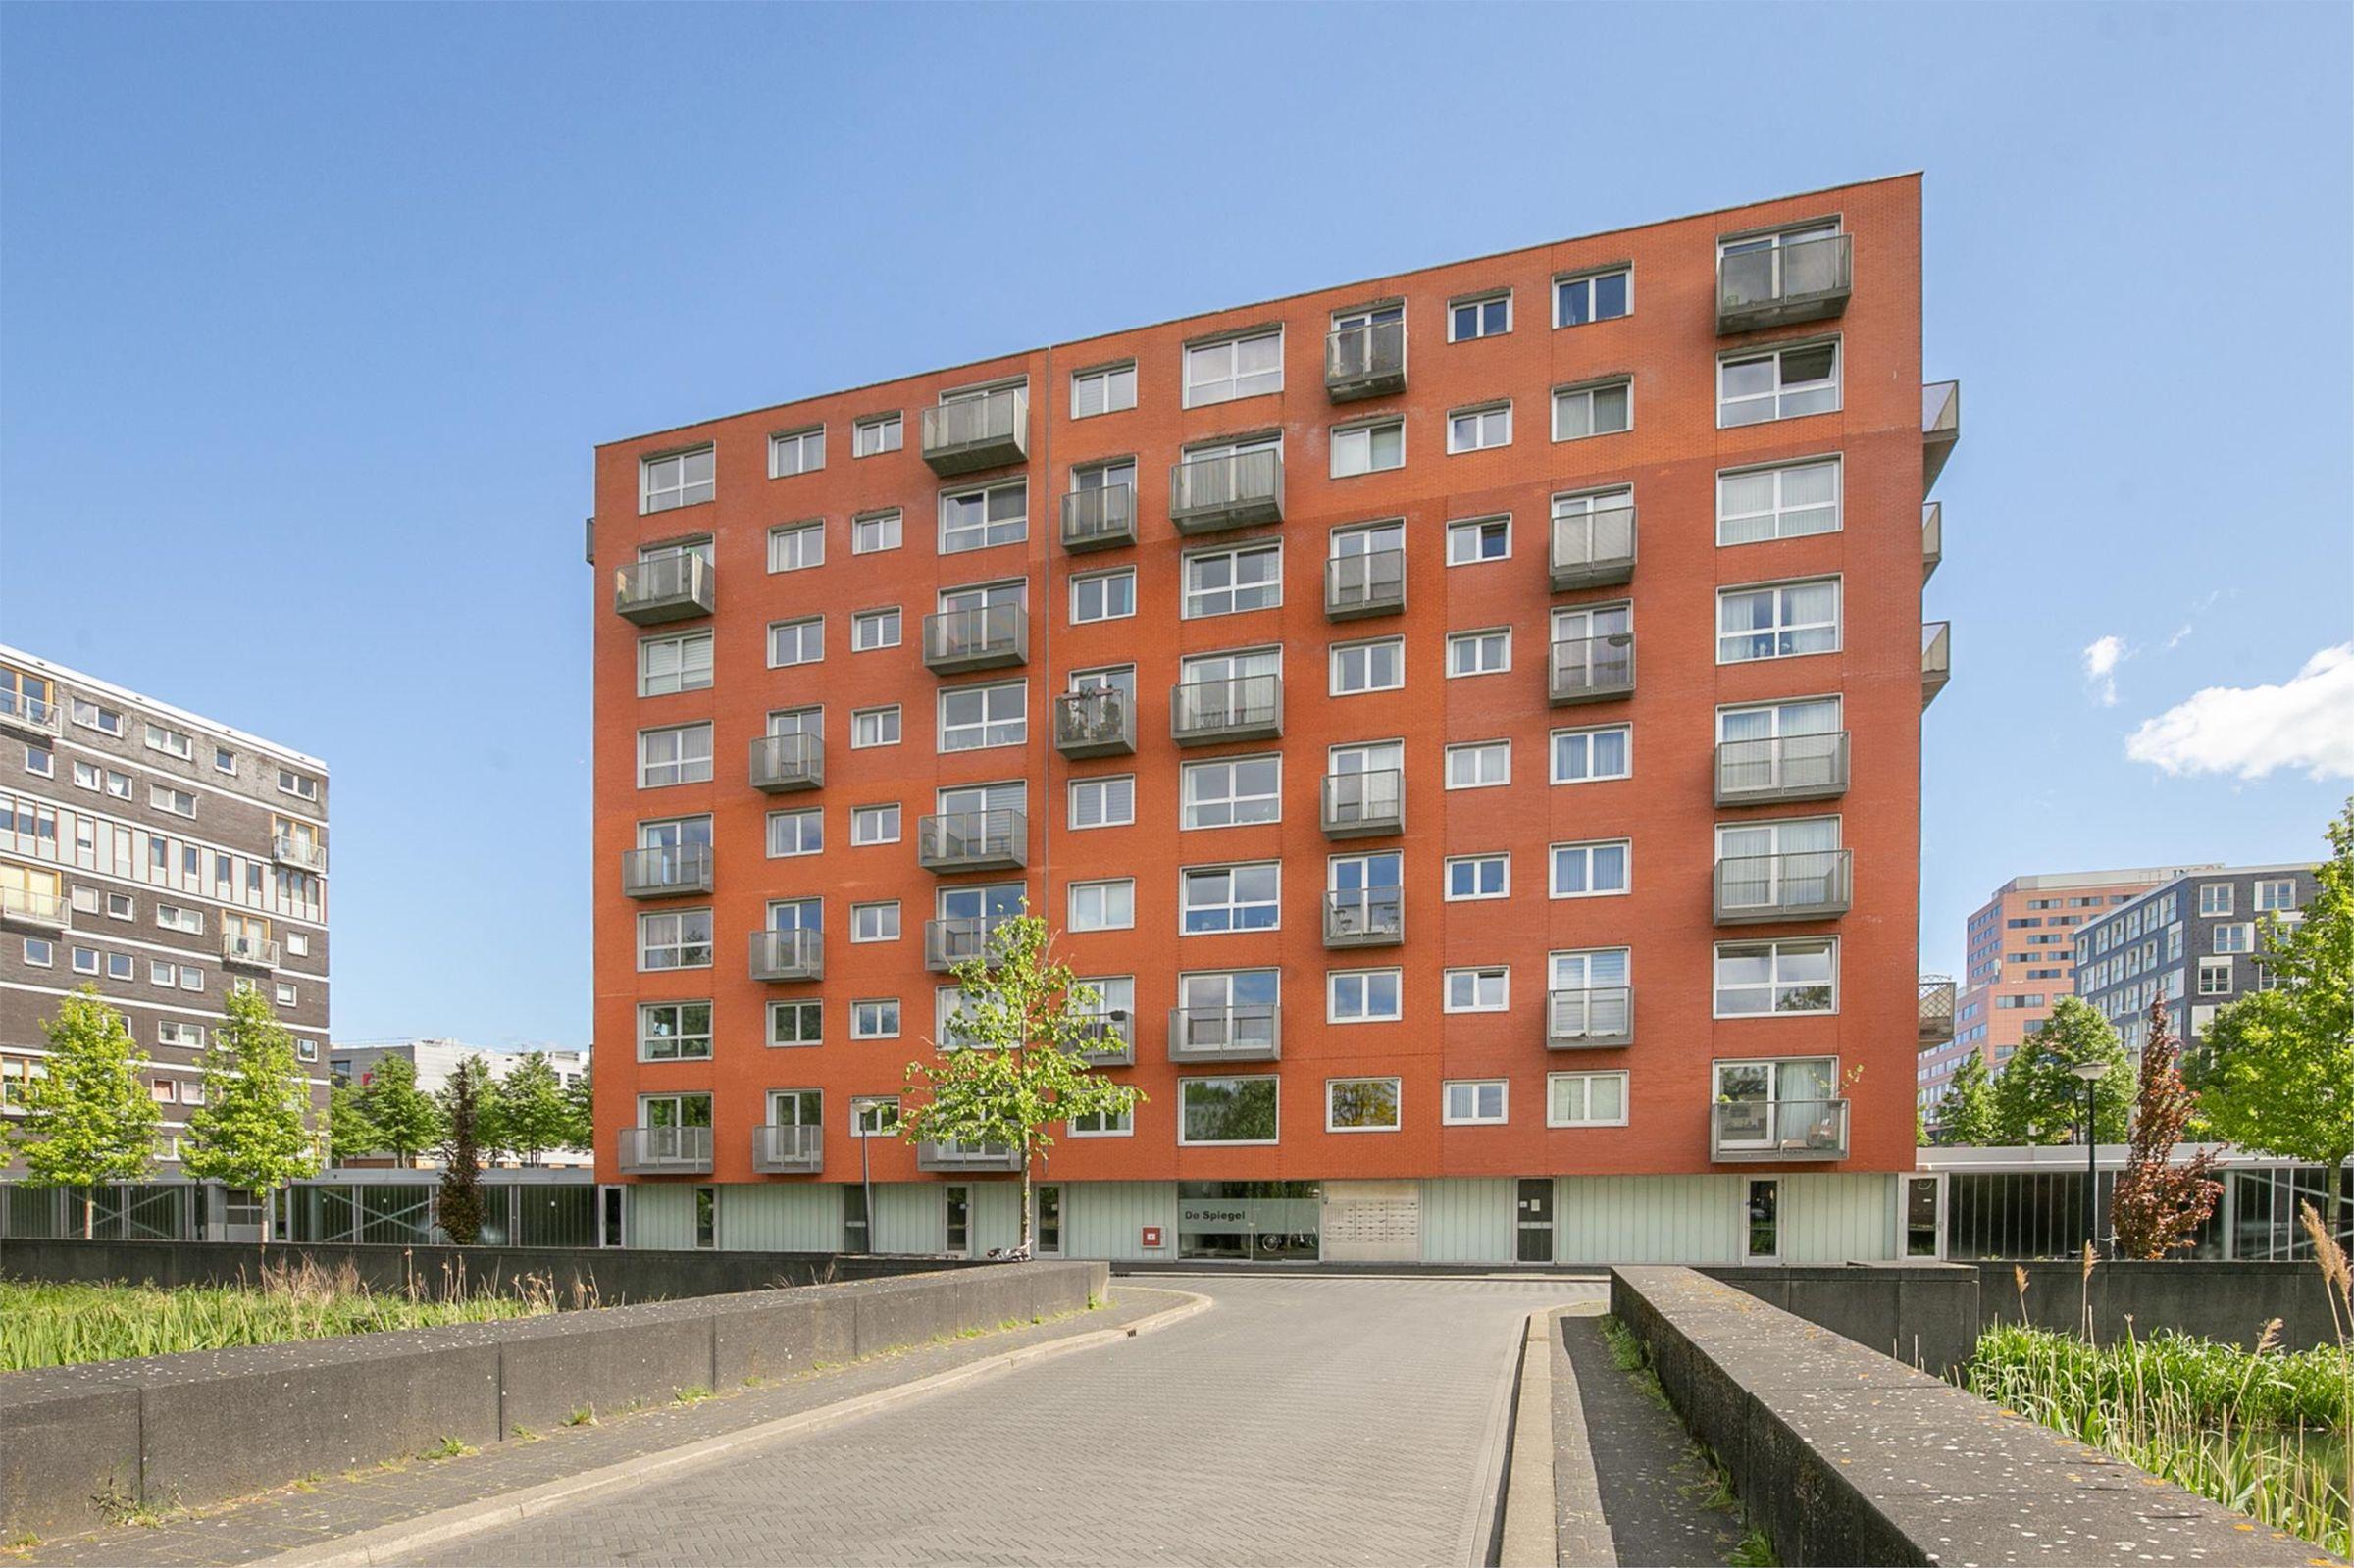 Anna Blamansingel 87, Amsterdam